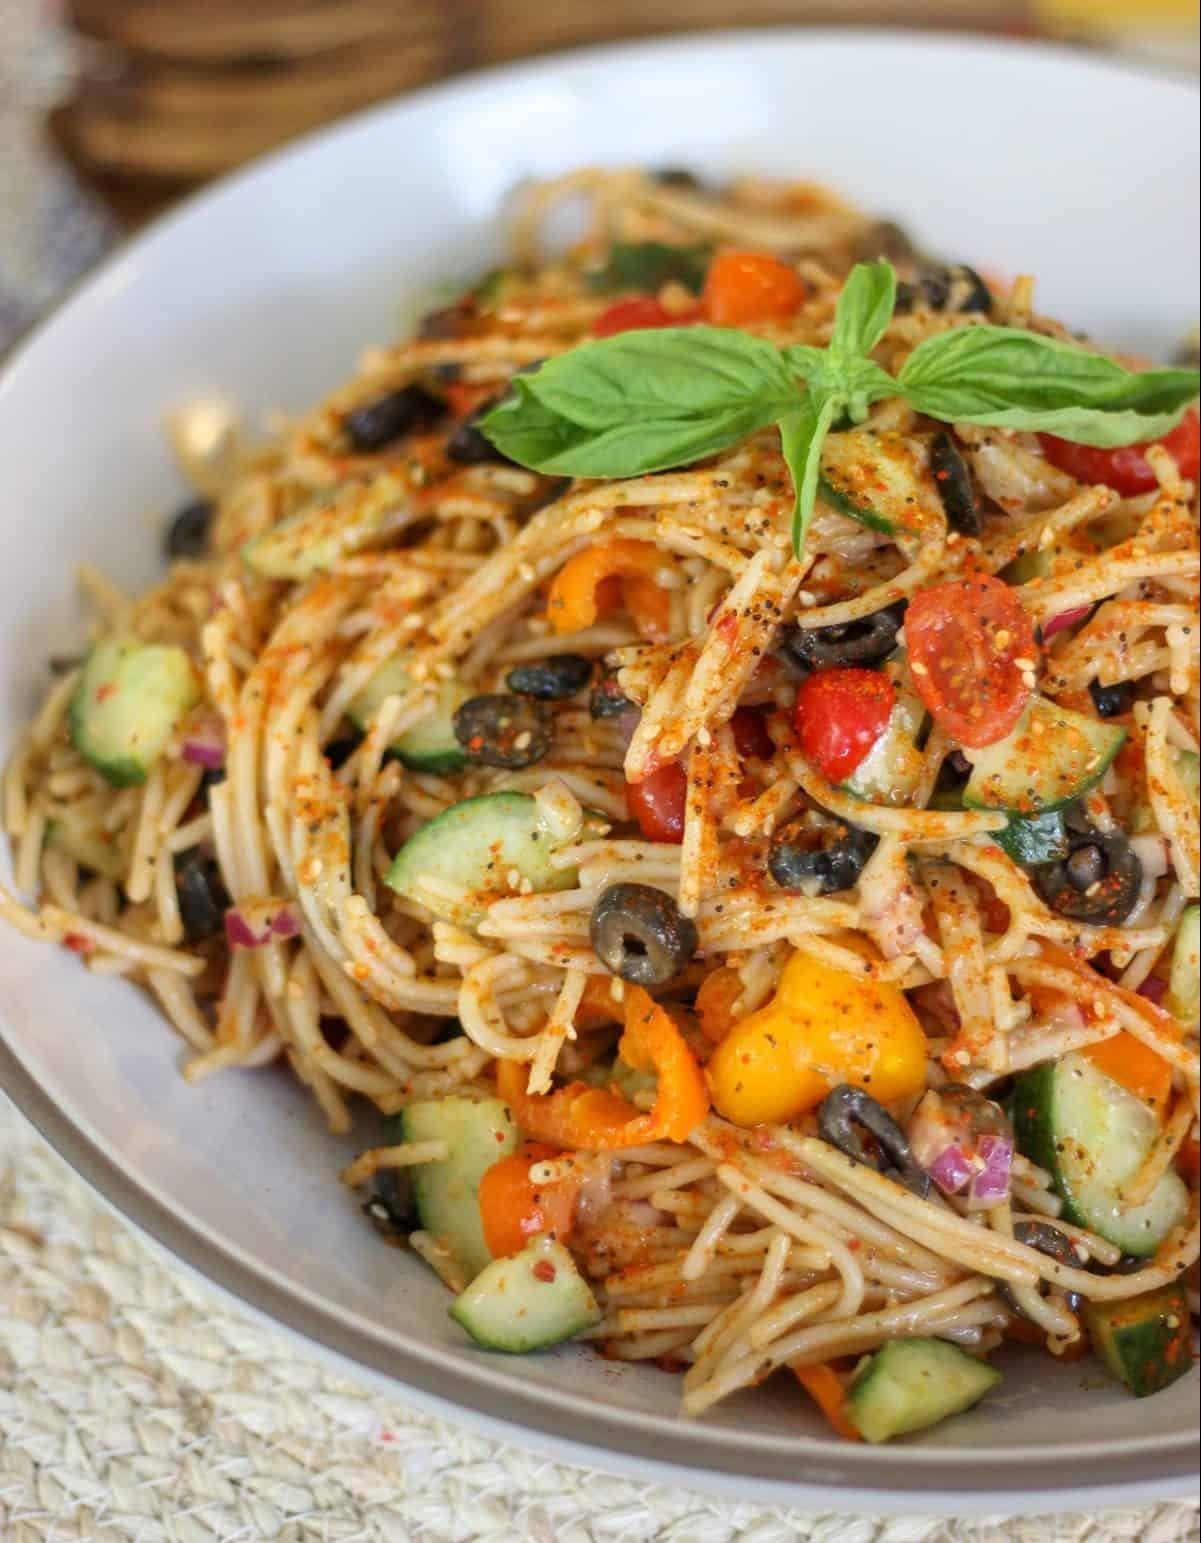 Spaghetti Salad recipe with California Ripe Olives